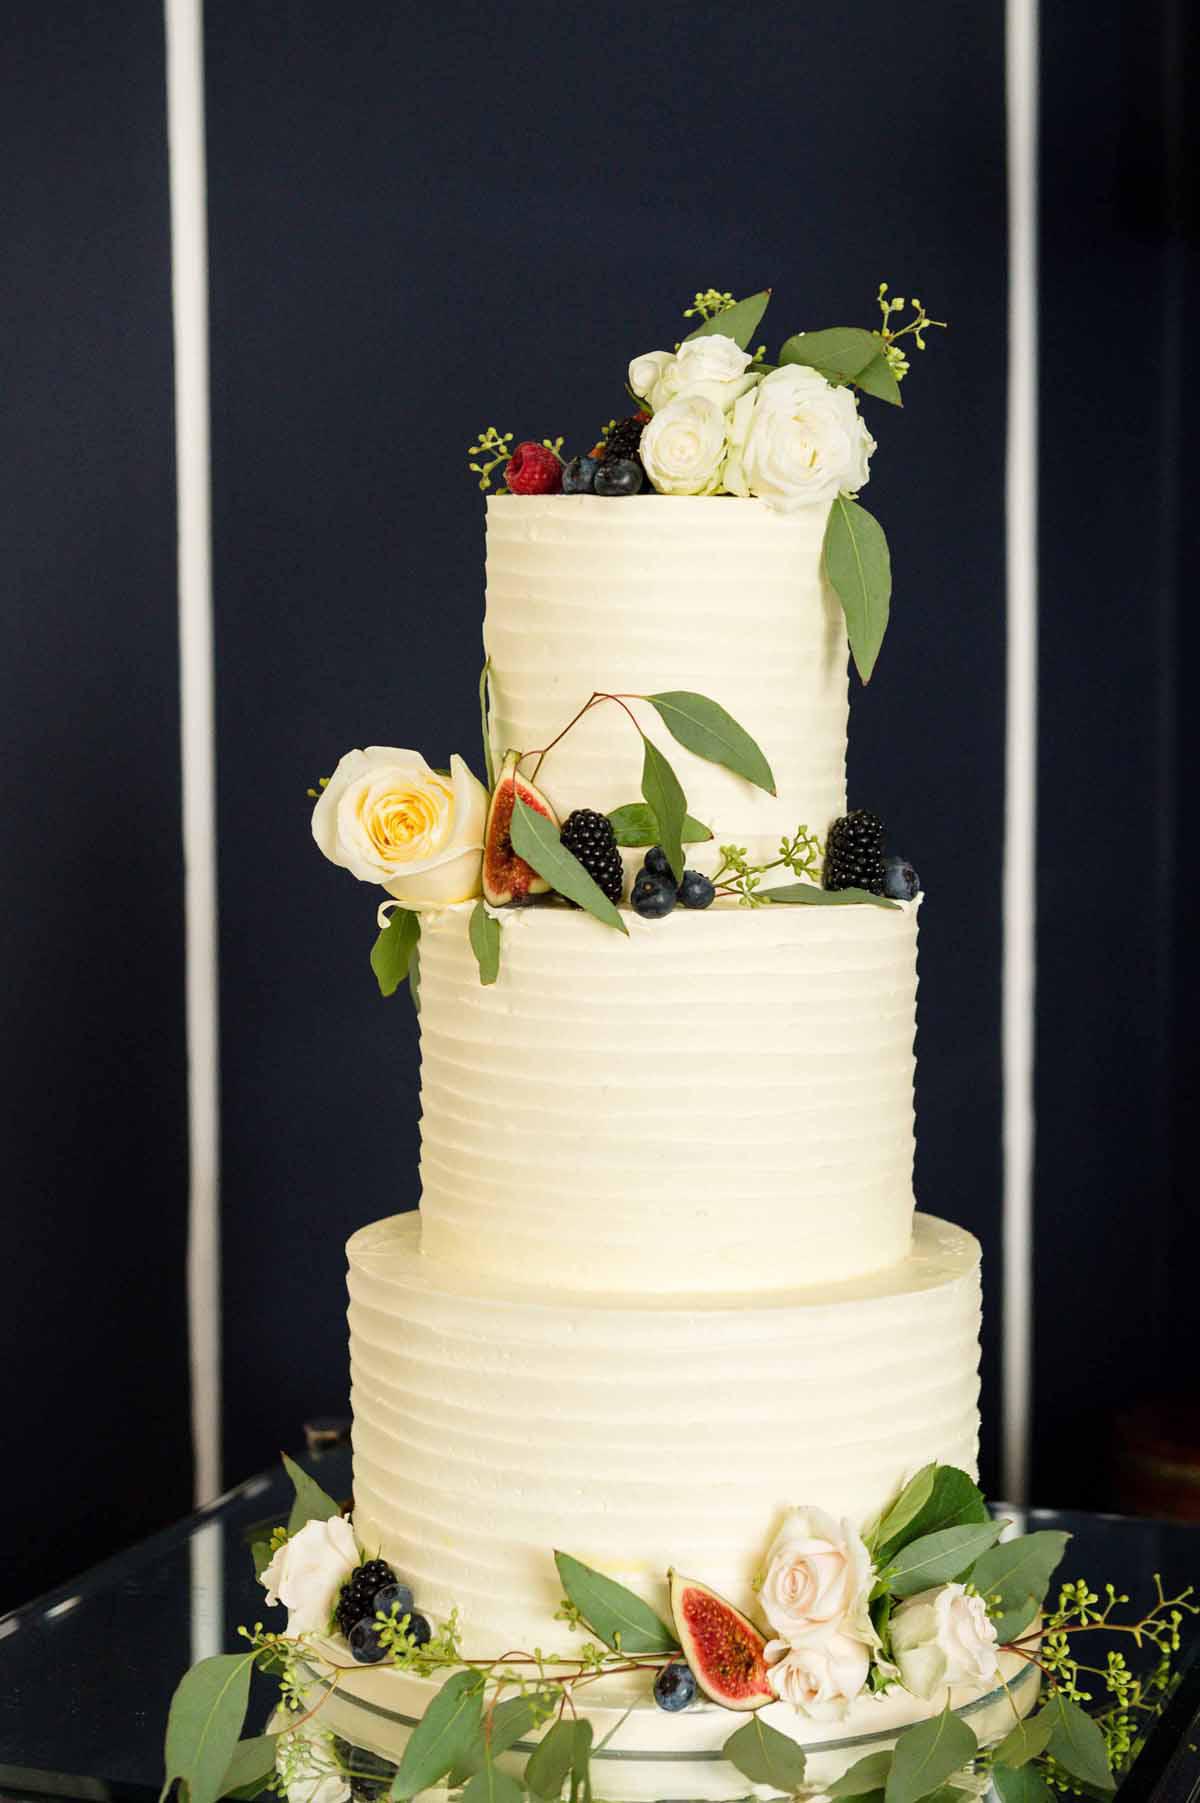 Wedding Cake at No 25 Fitzwilliam Place